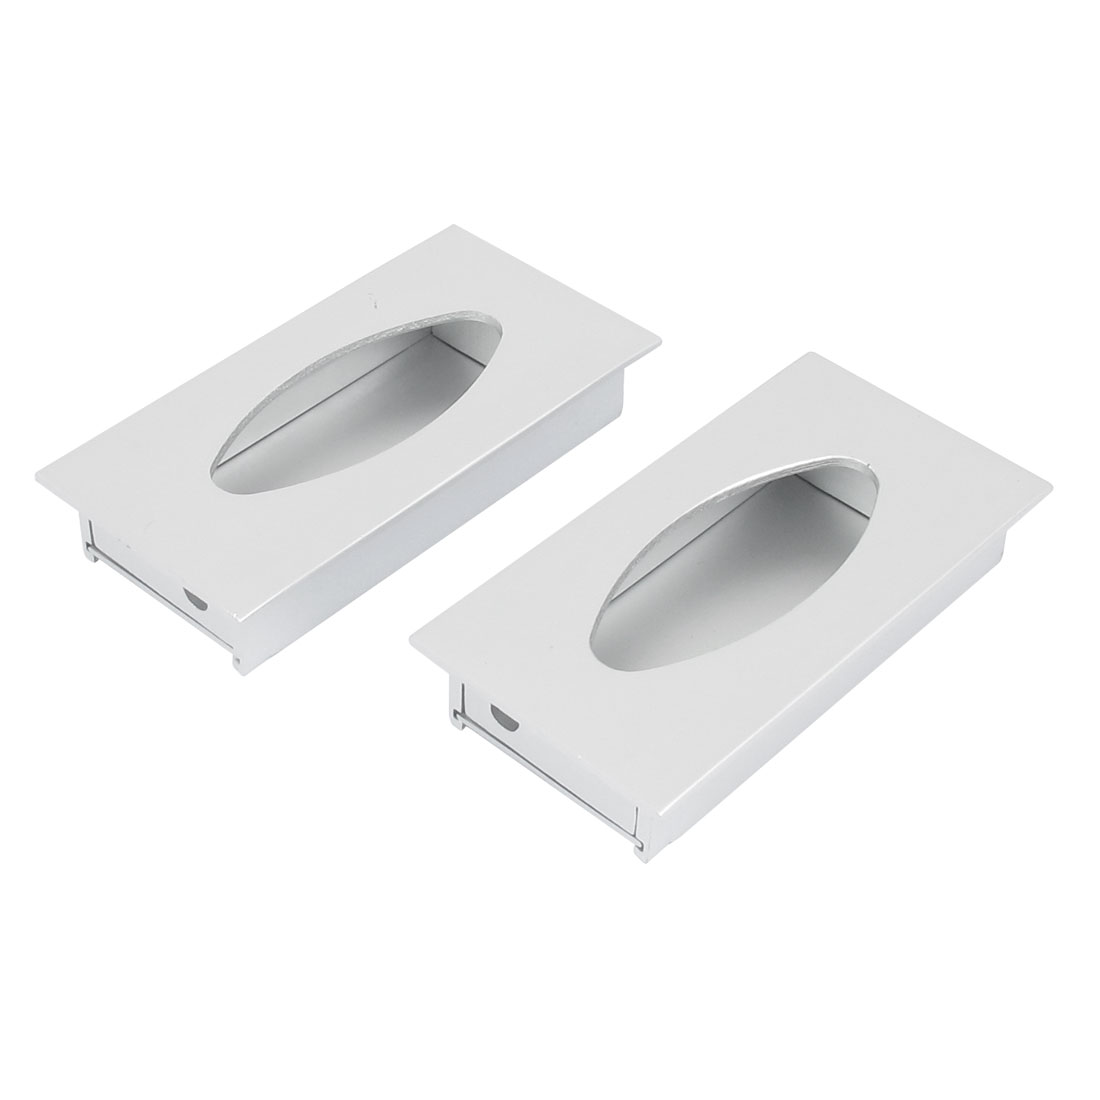 Drawer Closet Door Recessed Flush Pull Handle Hardware 80mmx42mm 2Pcs